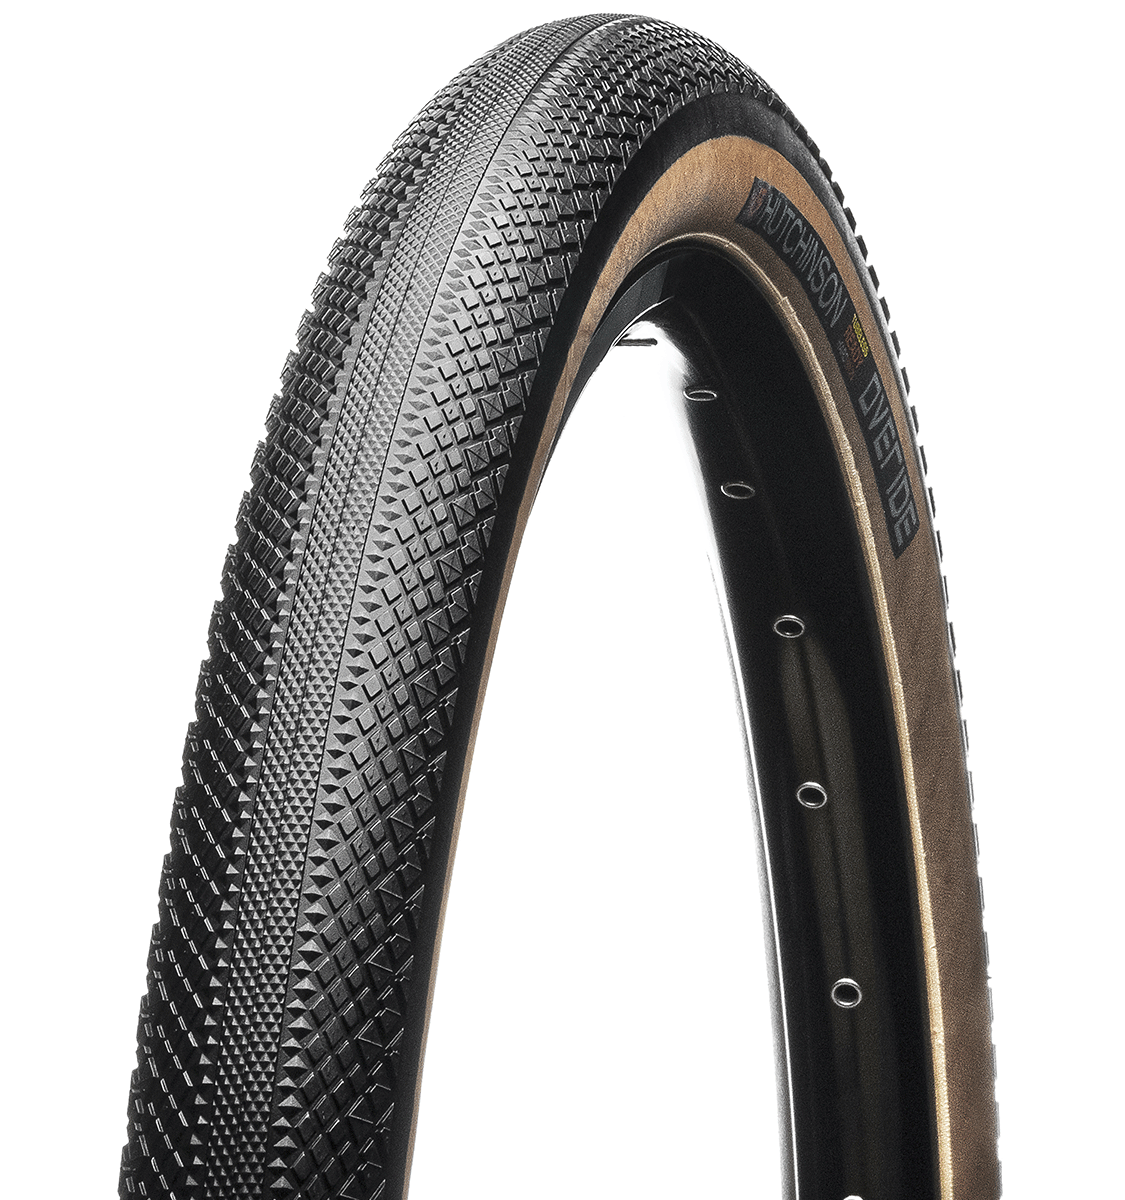 gravel-bike-tire-hutchinson-overide-4